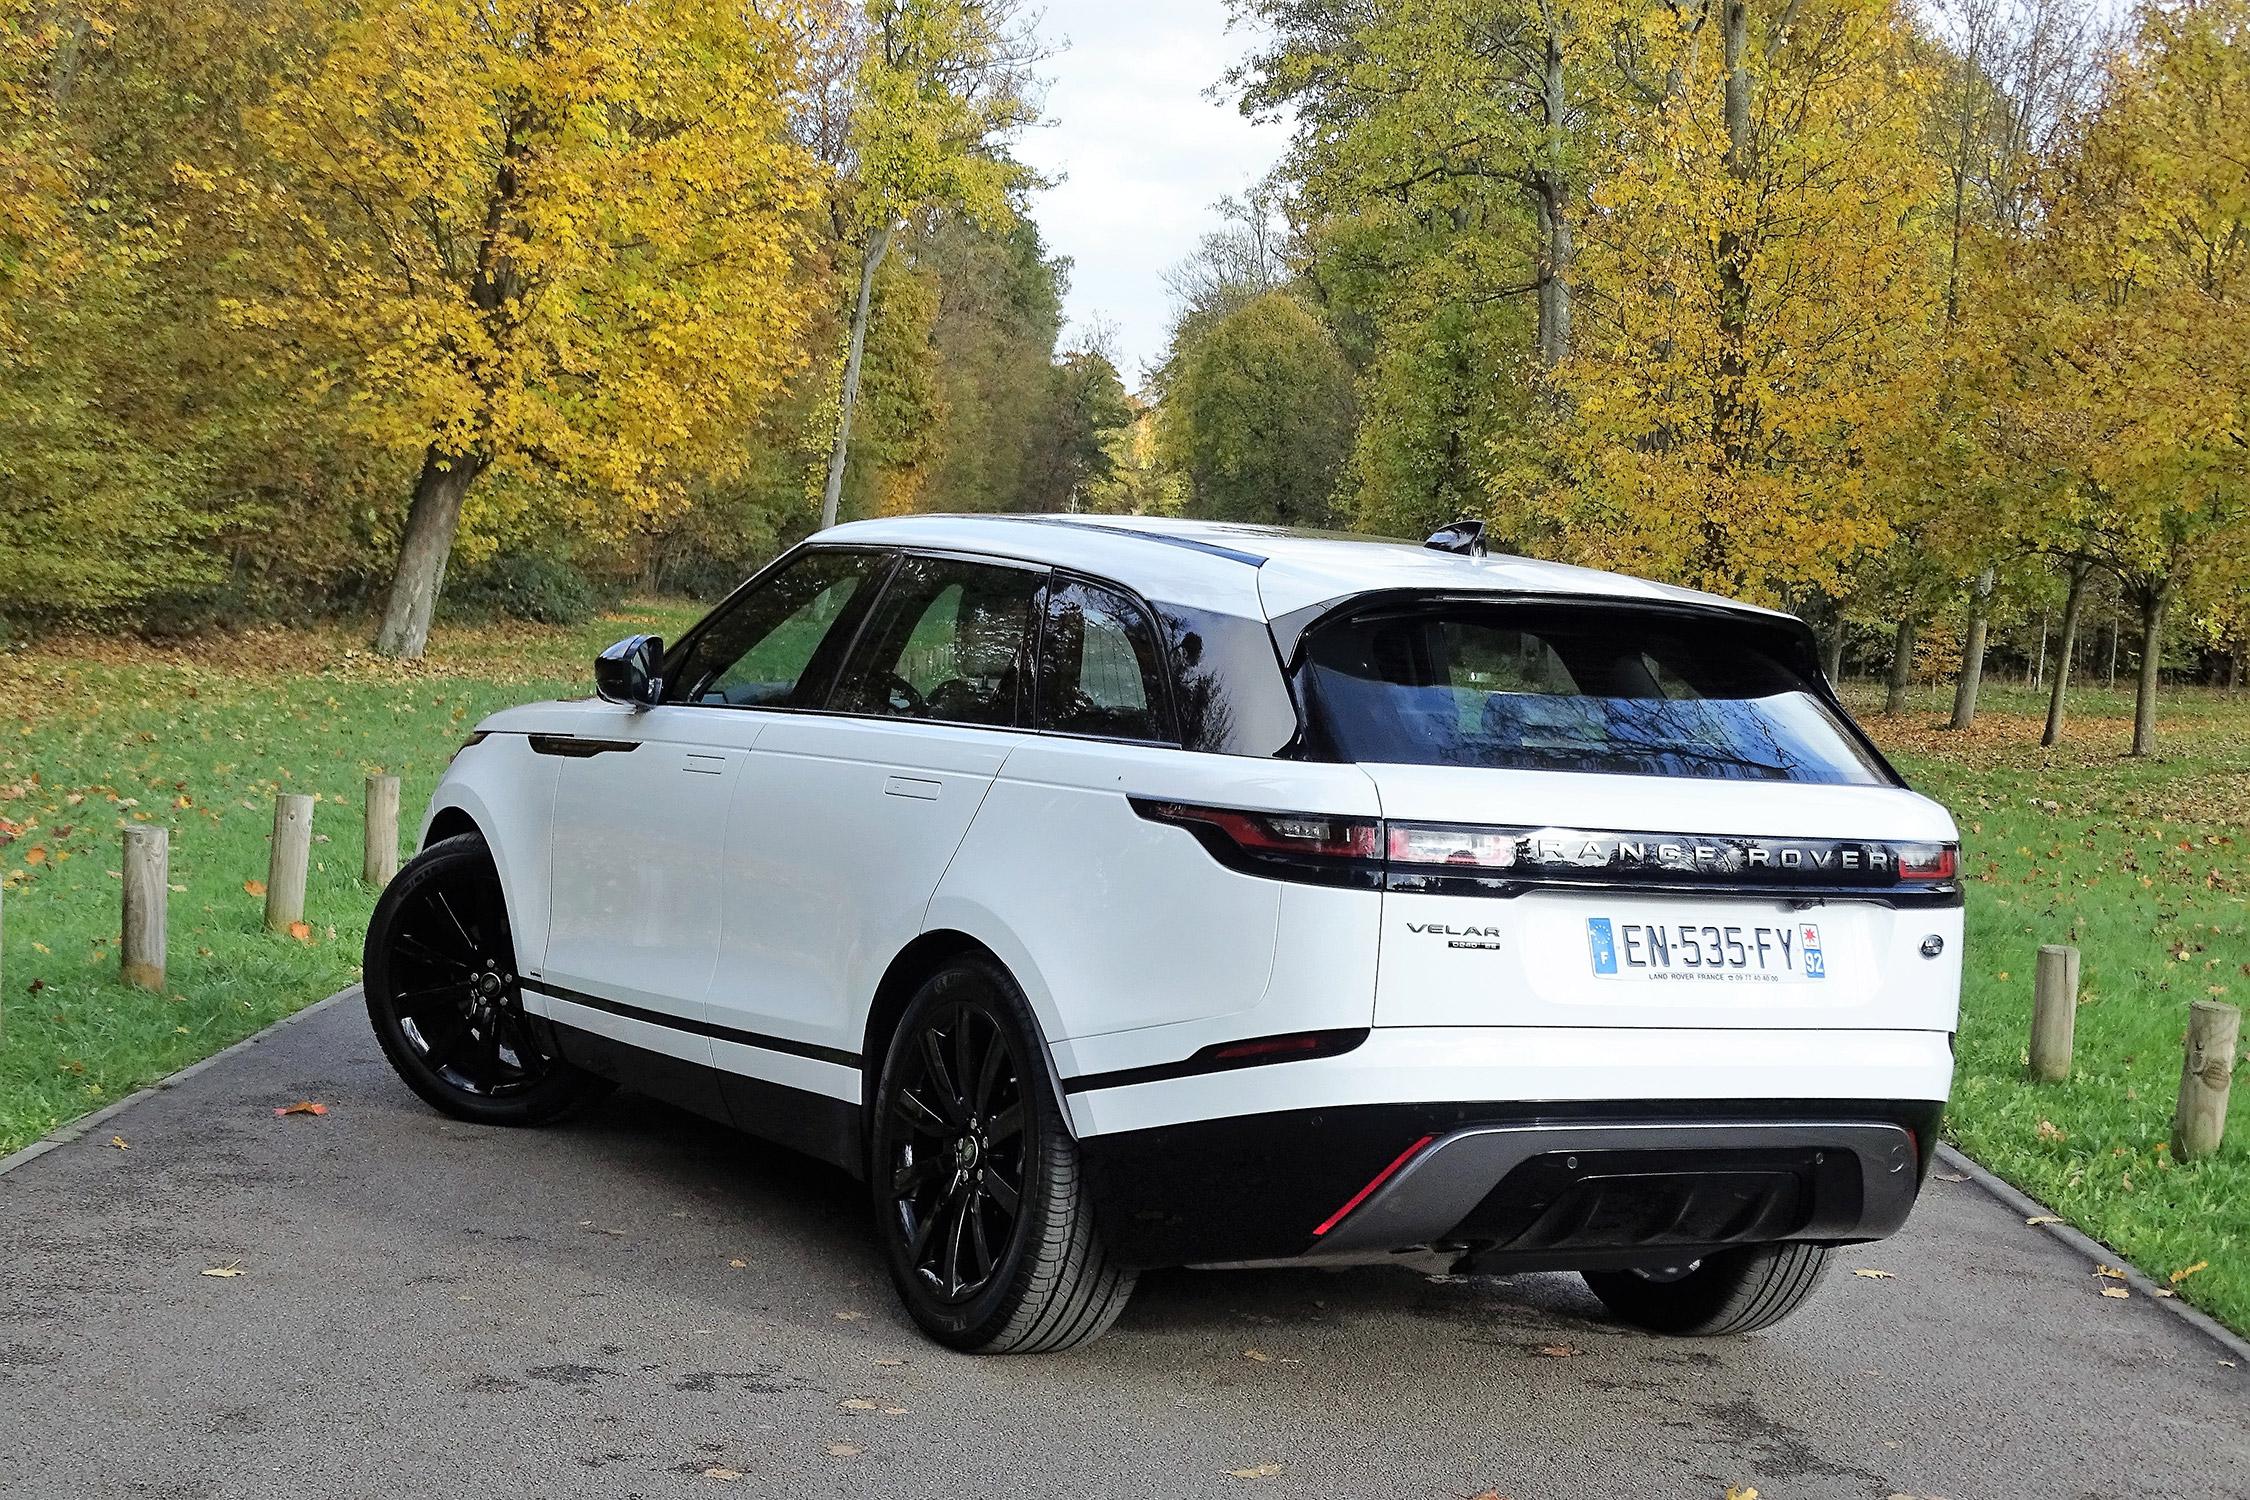 Essai Land Rover Range Rover Velar D240 Motorlegend